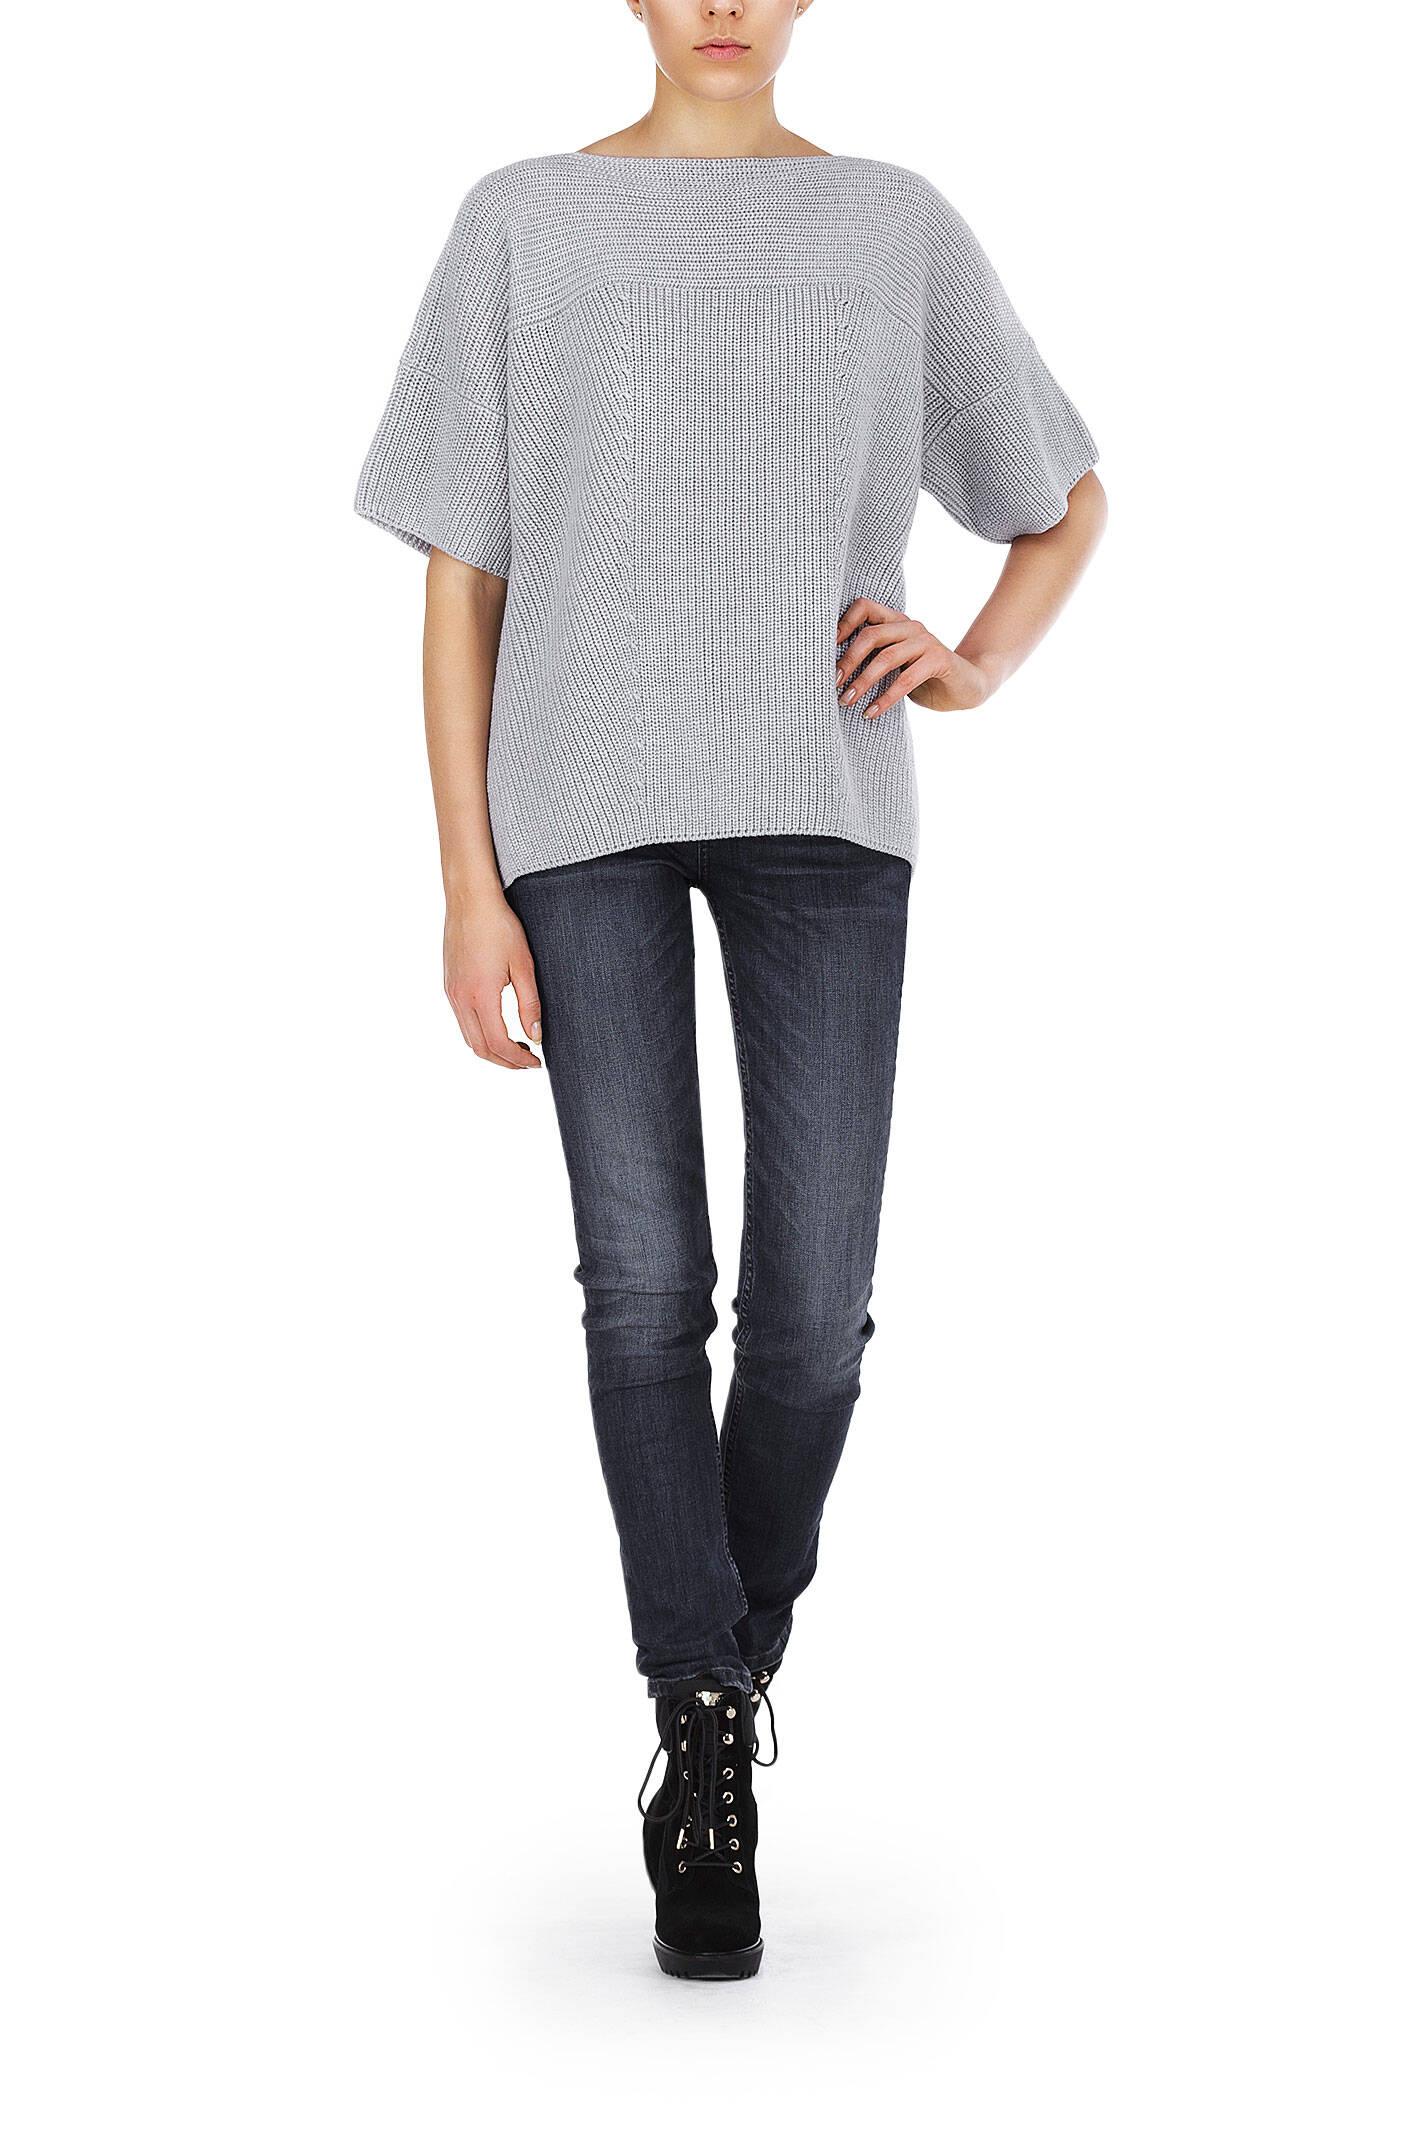 poggio sweater weekend max mara gray. Black Bedroom Furniture Sets. Home Design Ideas